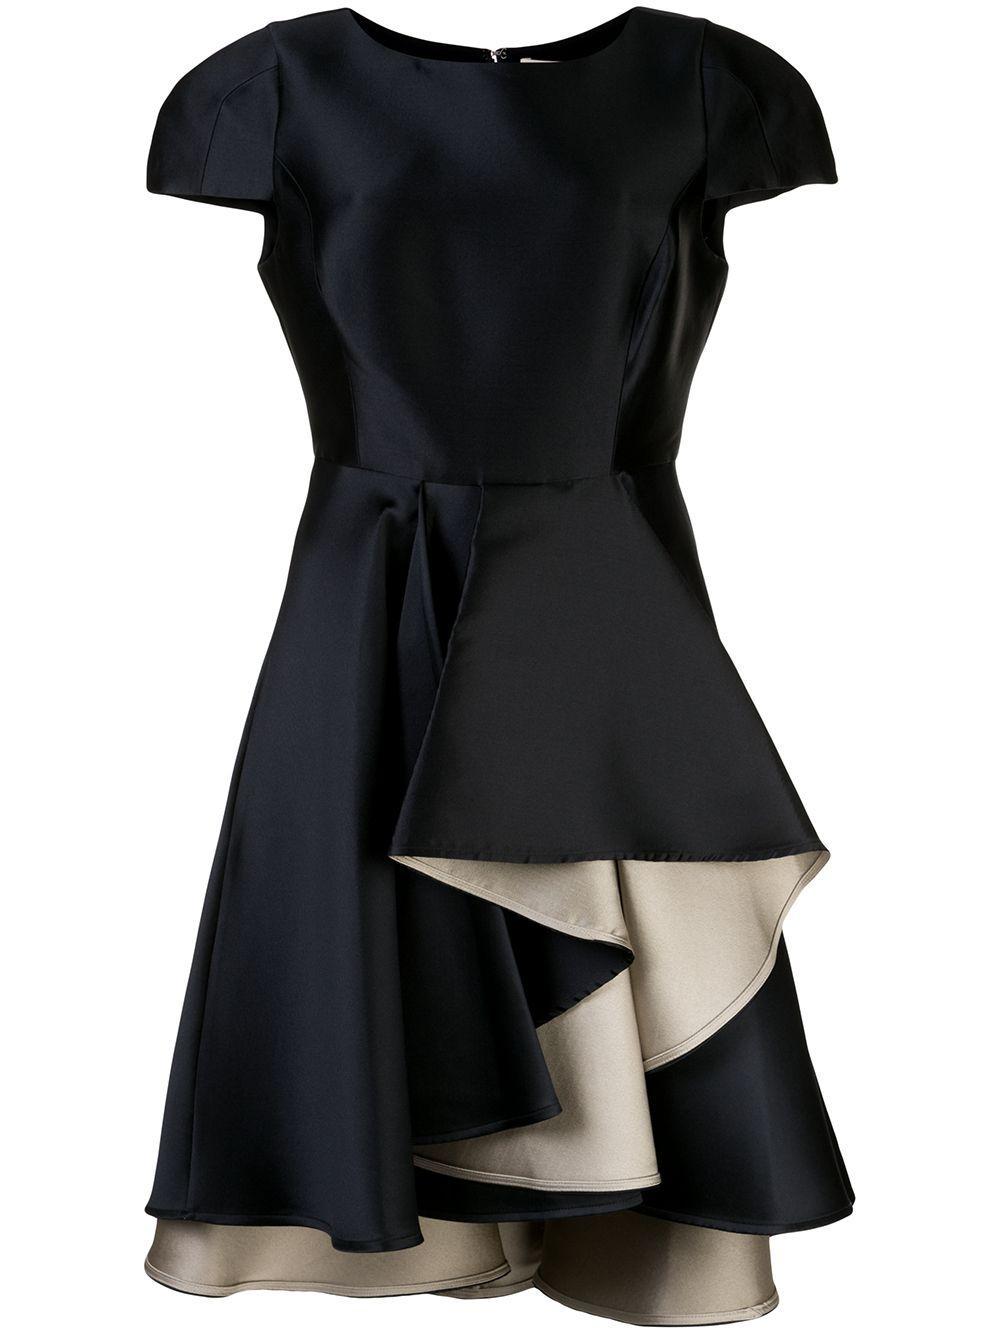 Dramatic Skirt Cap Sleeve Dress Item # 1012246